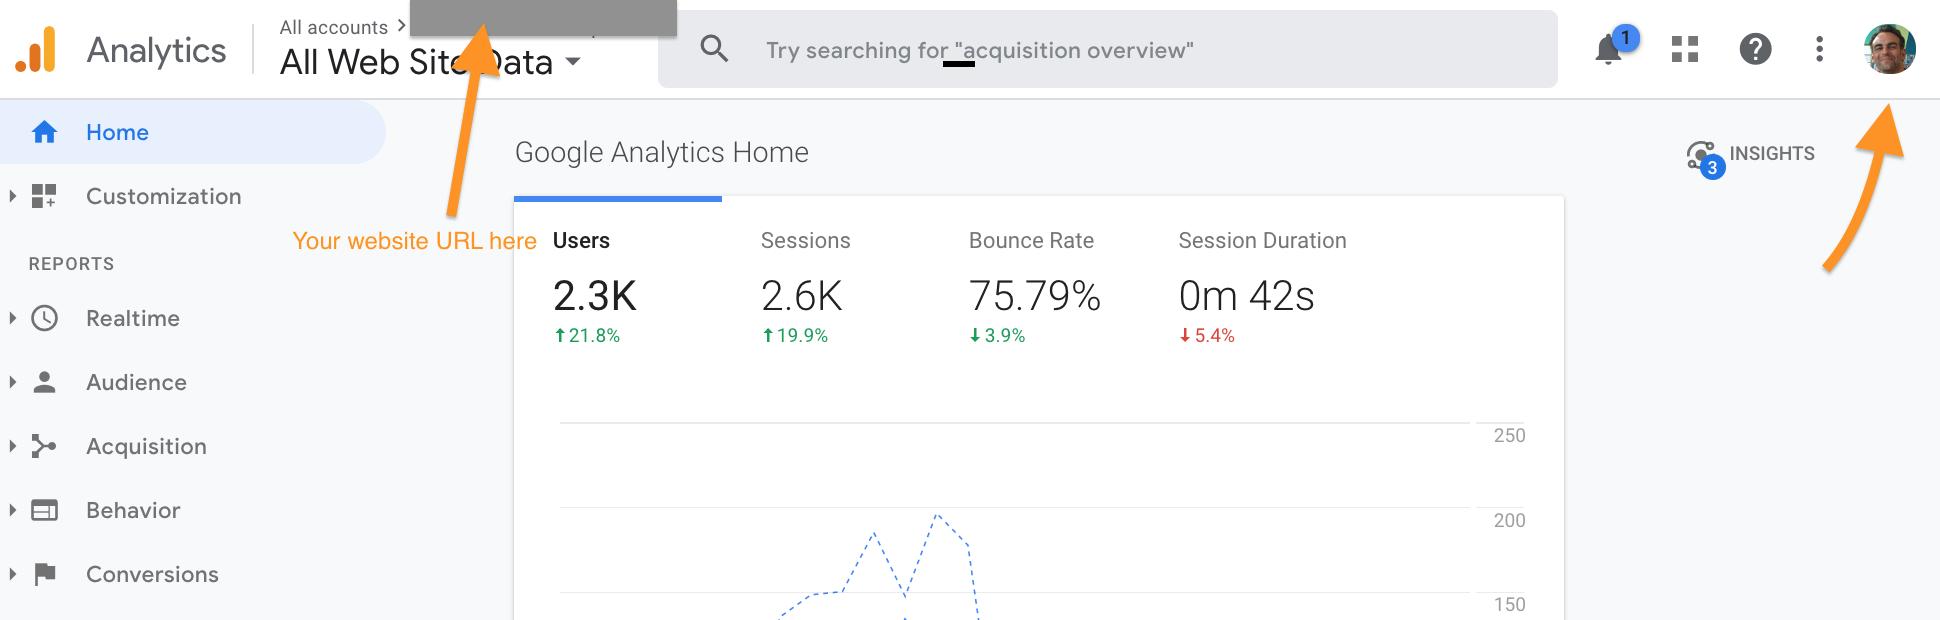 Google Analytics screen capture